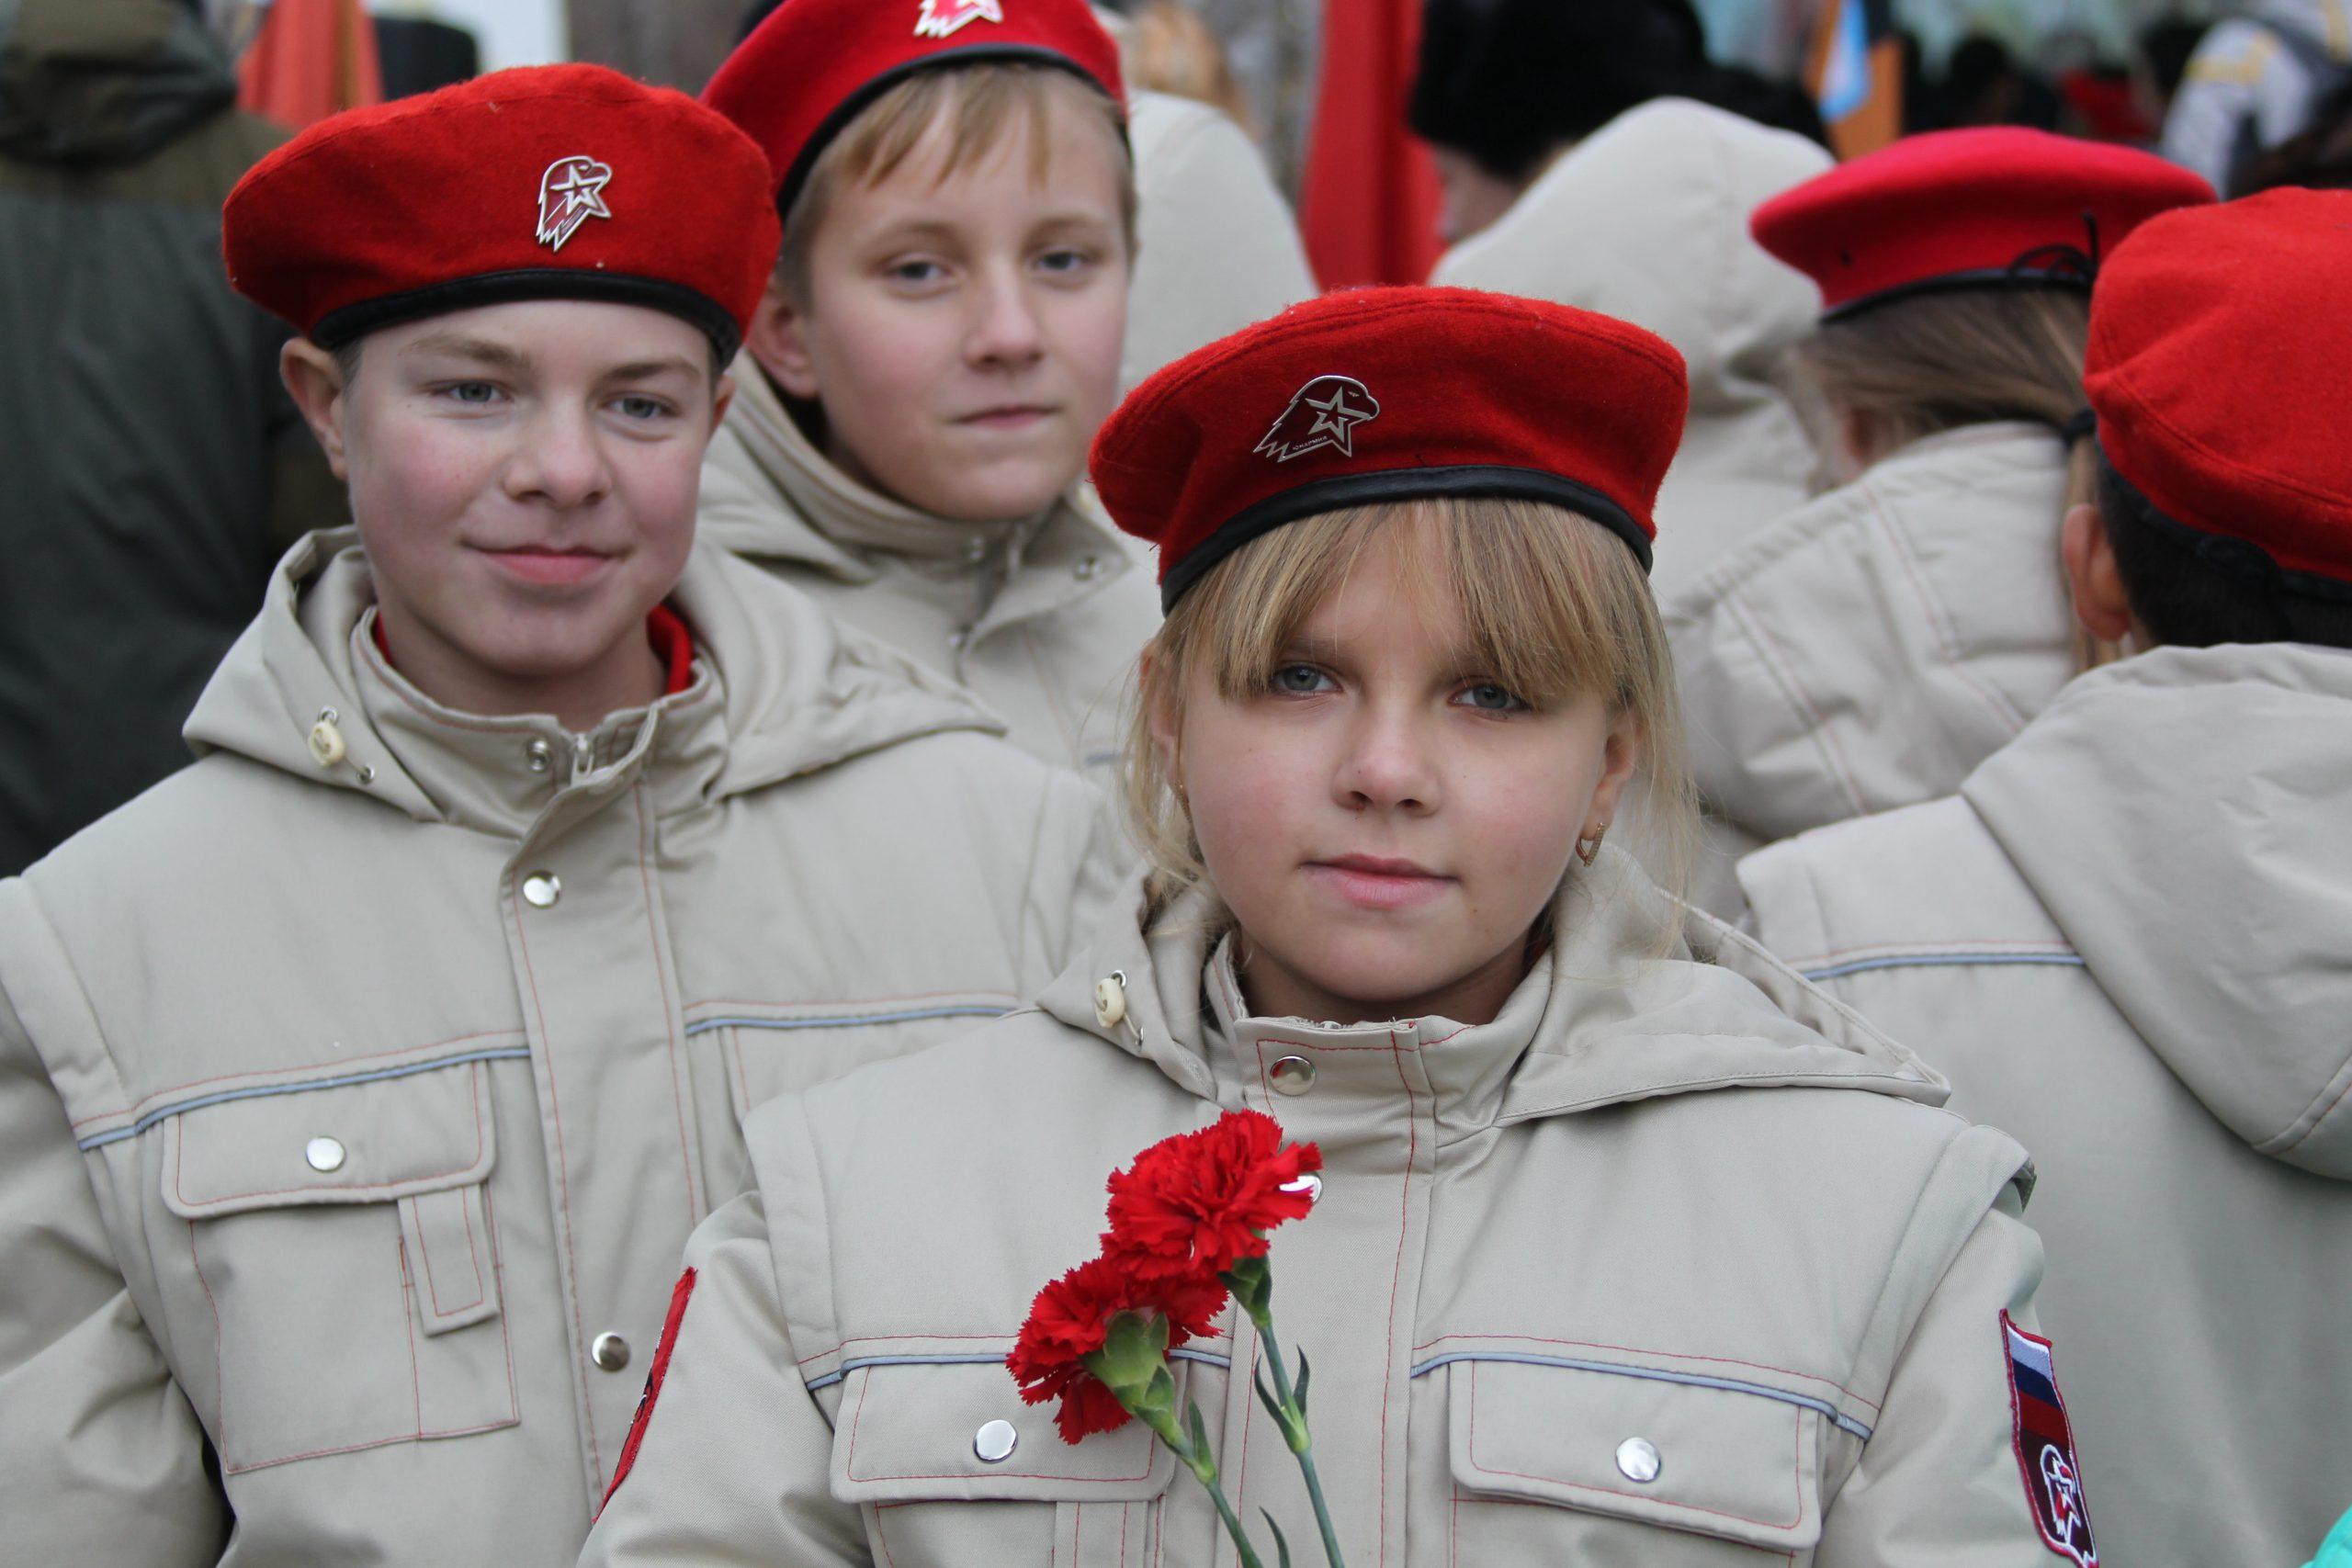 Видеолекторий о битве в Сталинграде представят сотрудники Культурного центра «Ватутинки» в Десеновском